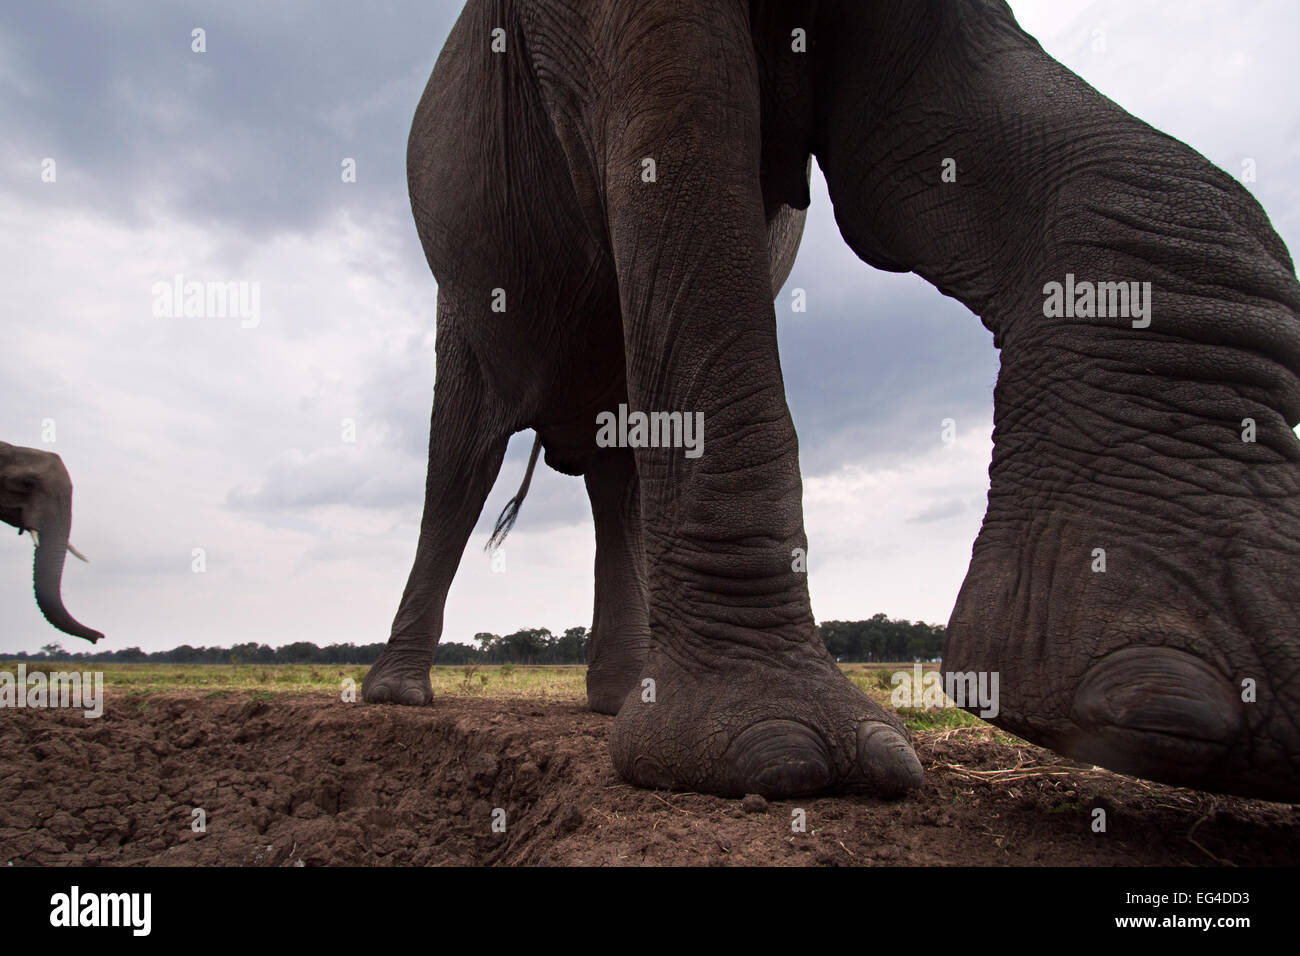 African elephant (Loxodonta africana) close-up. Masai Mara National Reserve Kenya. Taken remote wide angle camera. Stock Photo